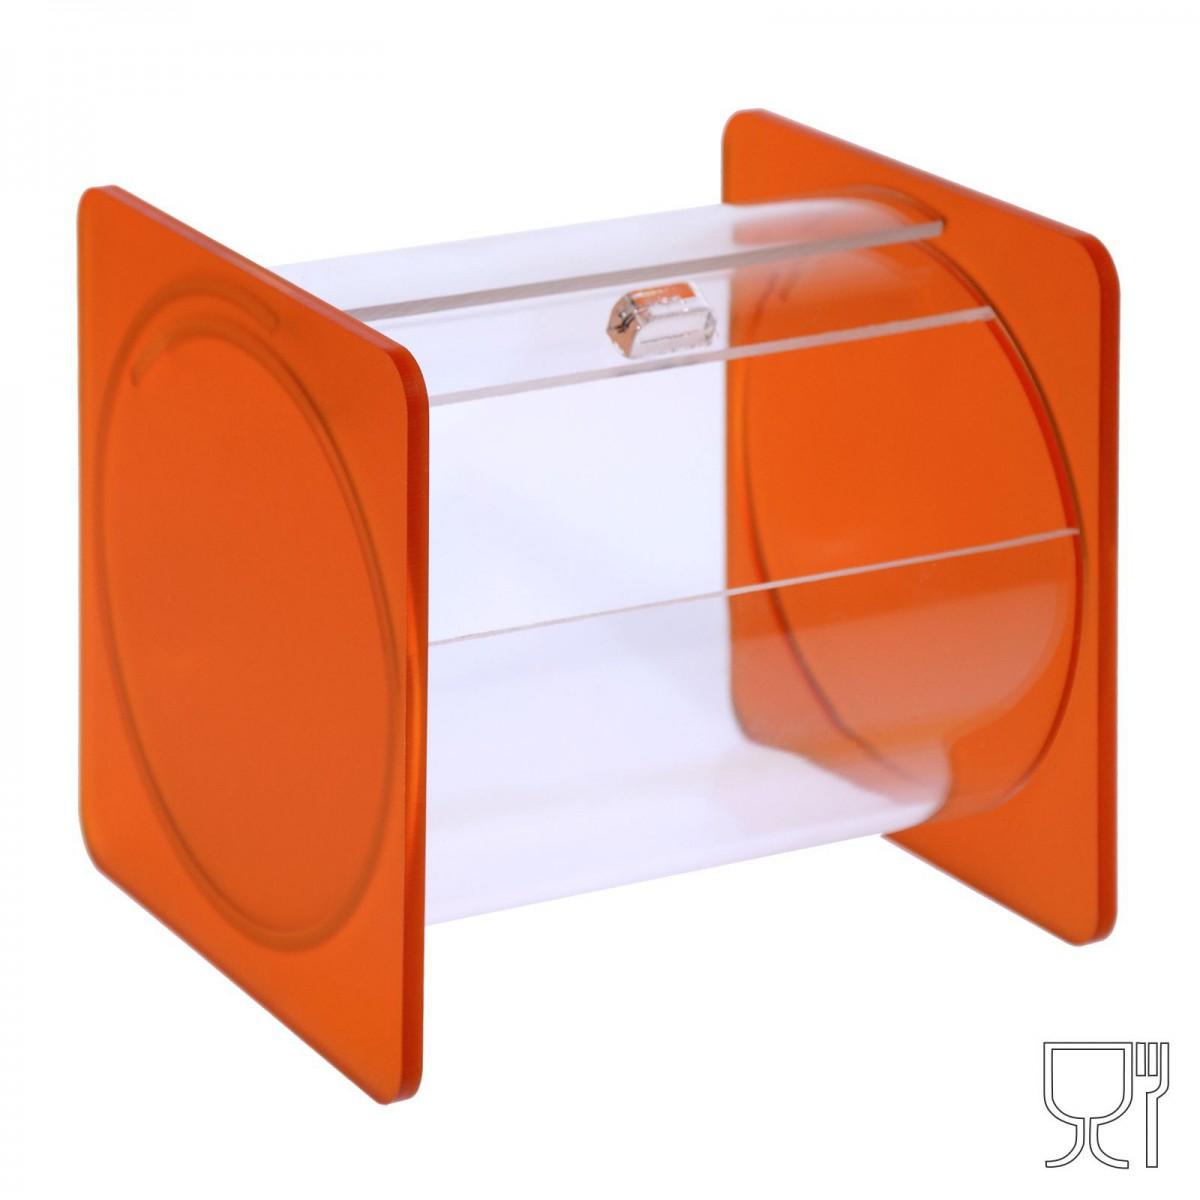 elegantstunning Linterna Led Clip Mini L/ámpara de Bolsillo Led/ Corto No Incluido /Linterna Led de Bolsillo Penlight Impermeable Alimentado por Pilas AAA